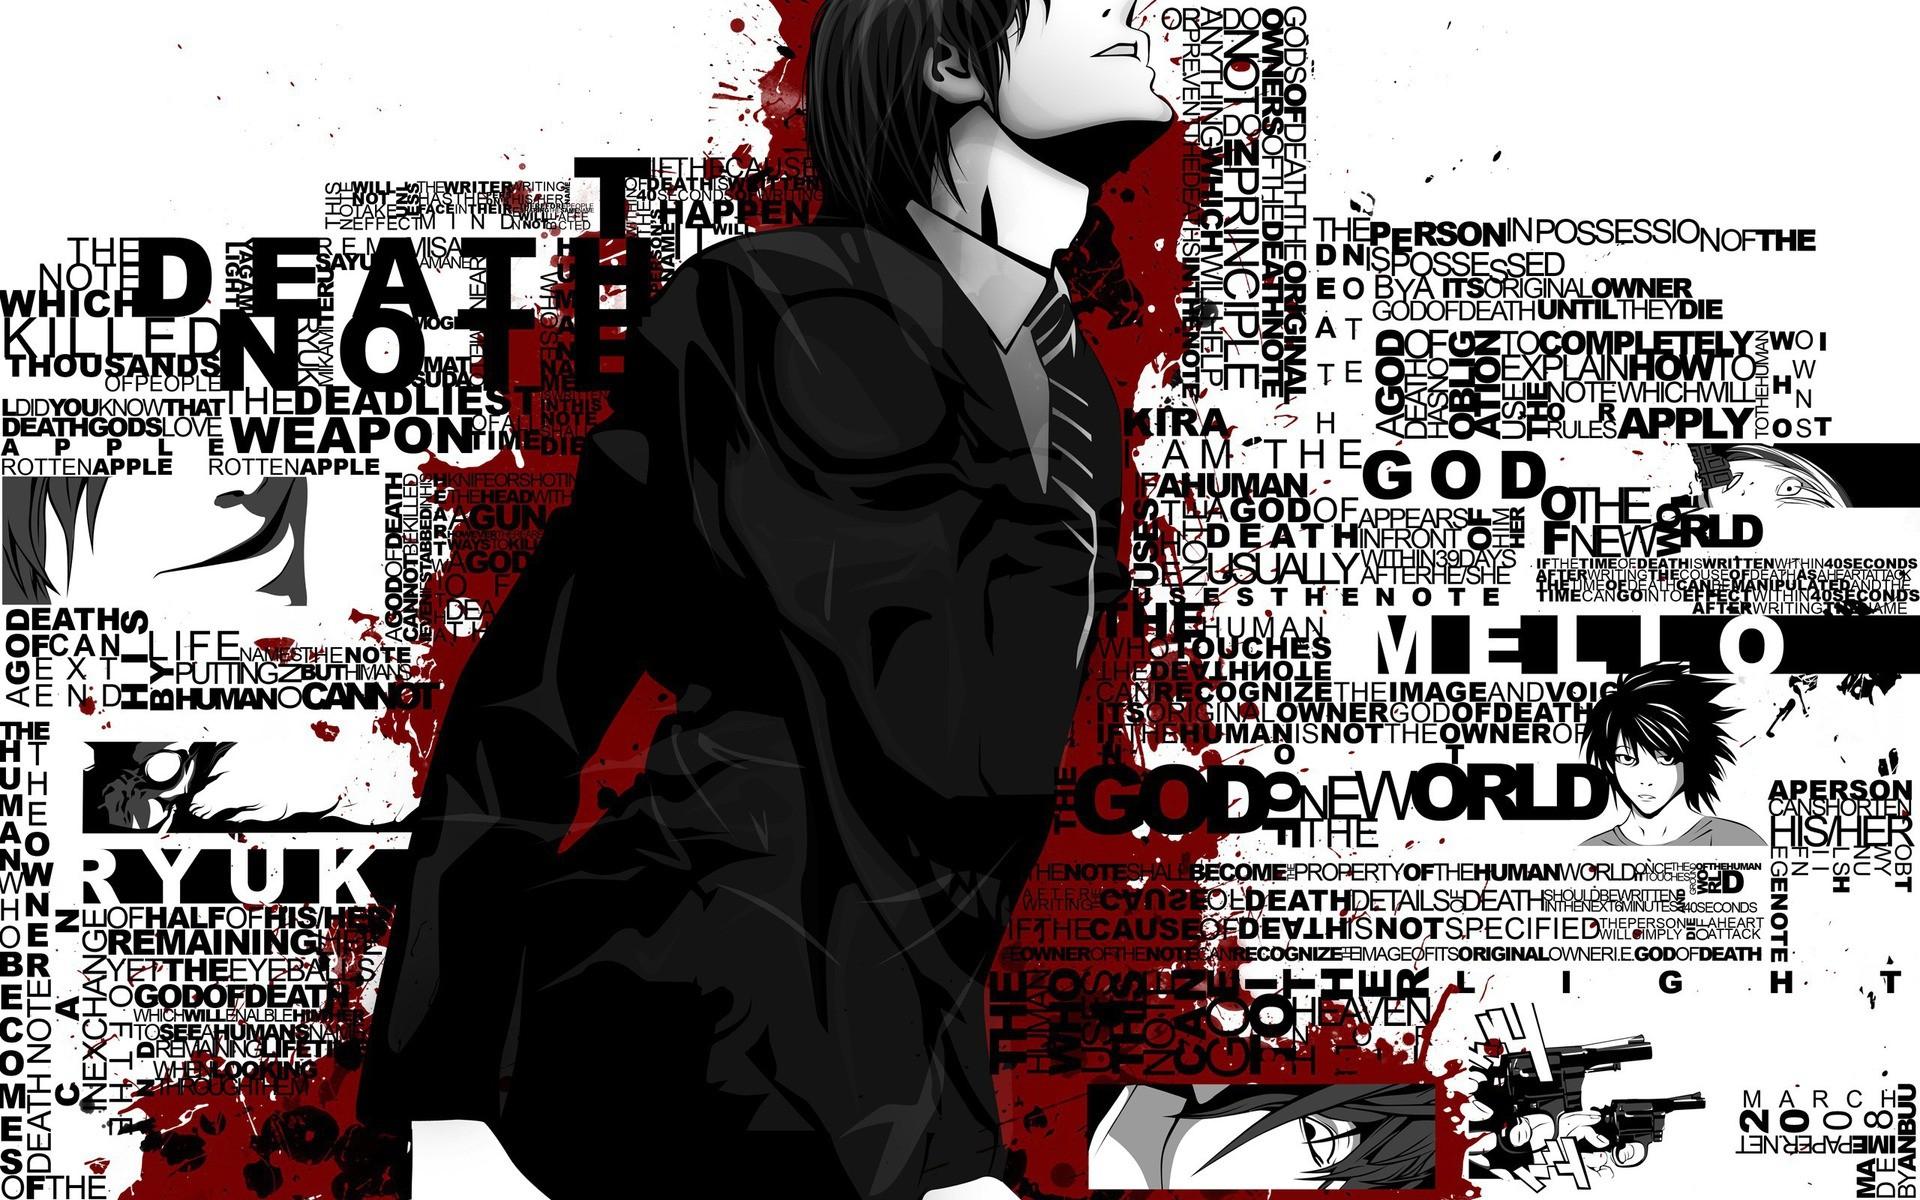 Wallpaper Illustration Anime Boys Typography Cartoon Comics Poster Death Note Yagami Light Font Album Cover Comic Book 1920x1200 Raga 240694 Hd Wallpapers Wallhere